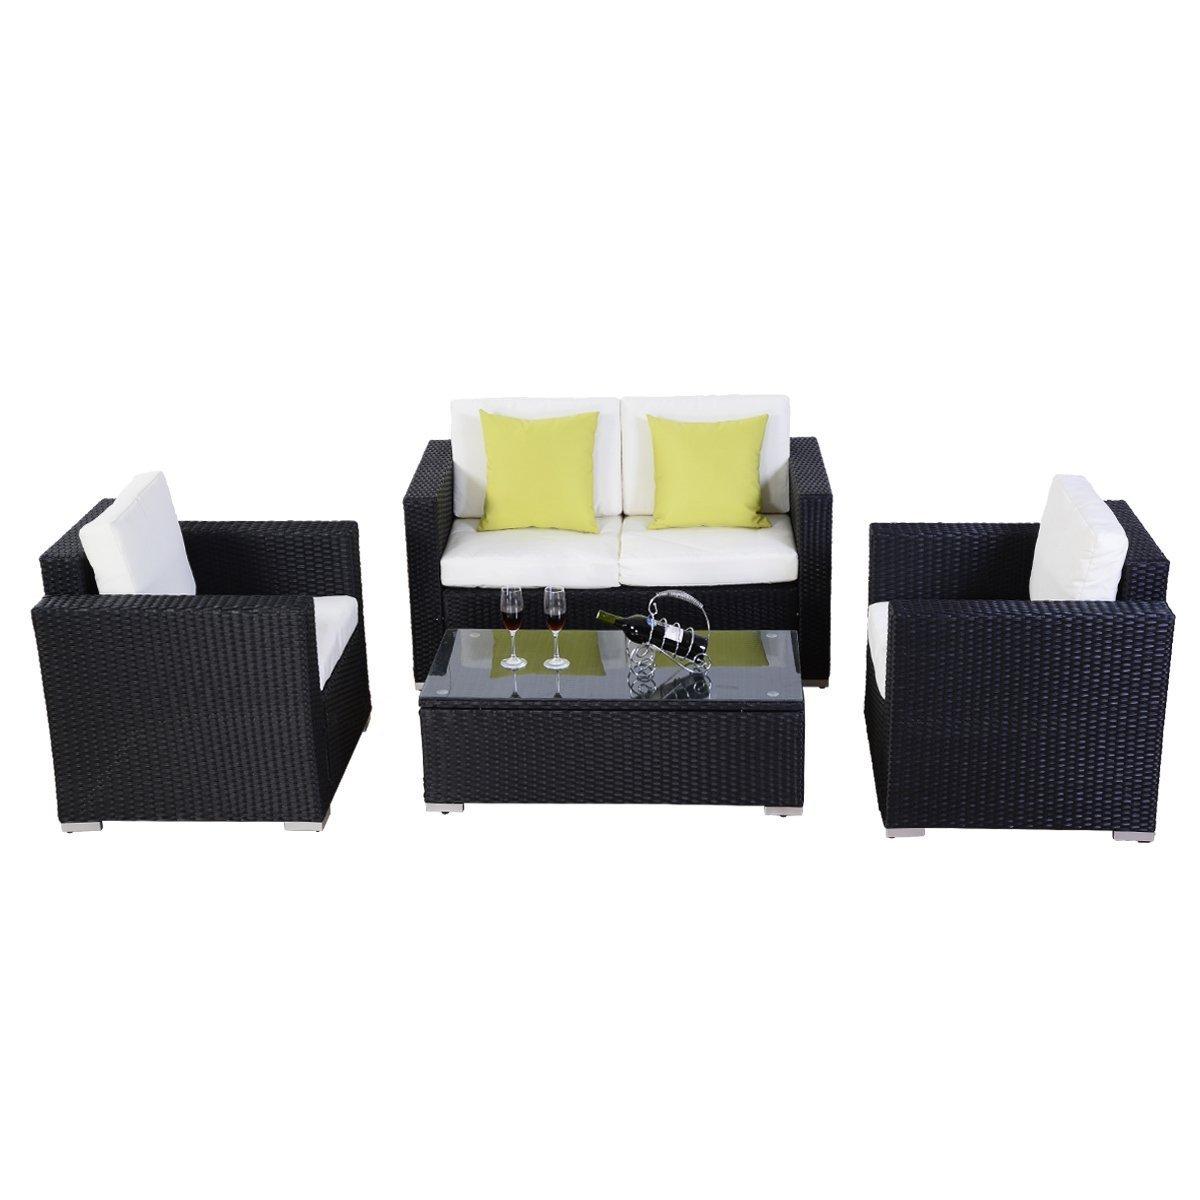 amazoncom 4pcs polar aurora black rattan wicker garden outdoor indoor sofa set furniture garden outdoor